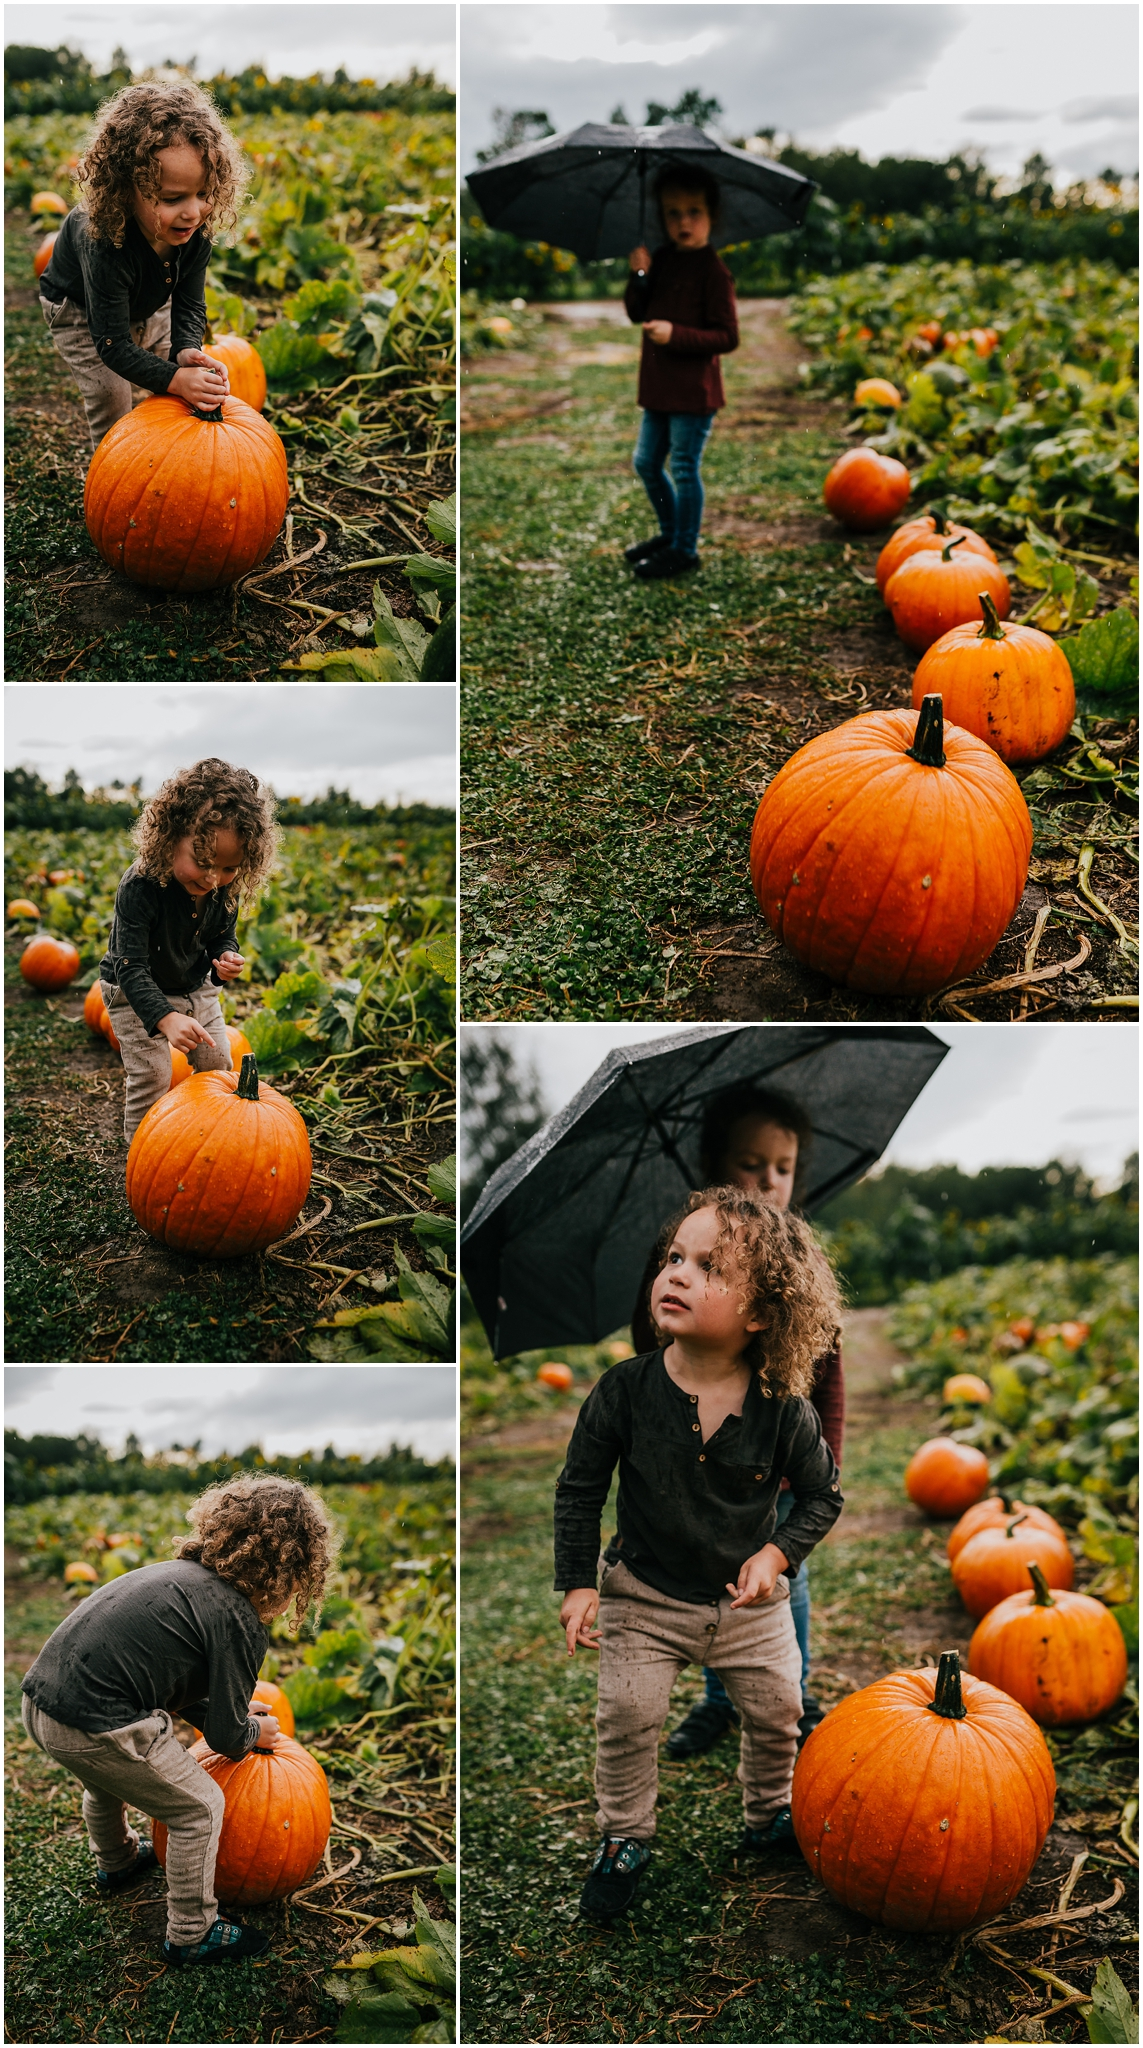 Treelines Photography - Edmonton Family Photographer - U-Pick Pumpkins - Halloween Edmonton